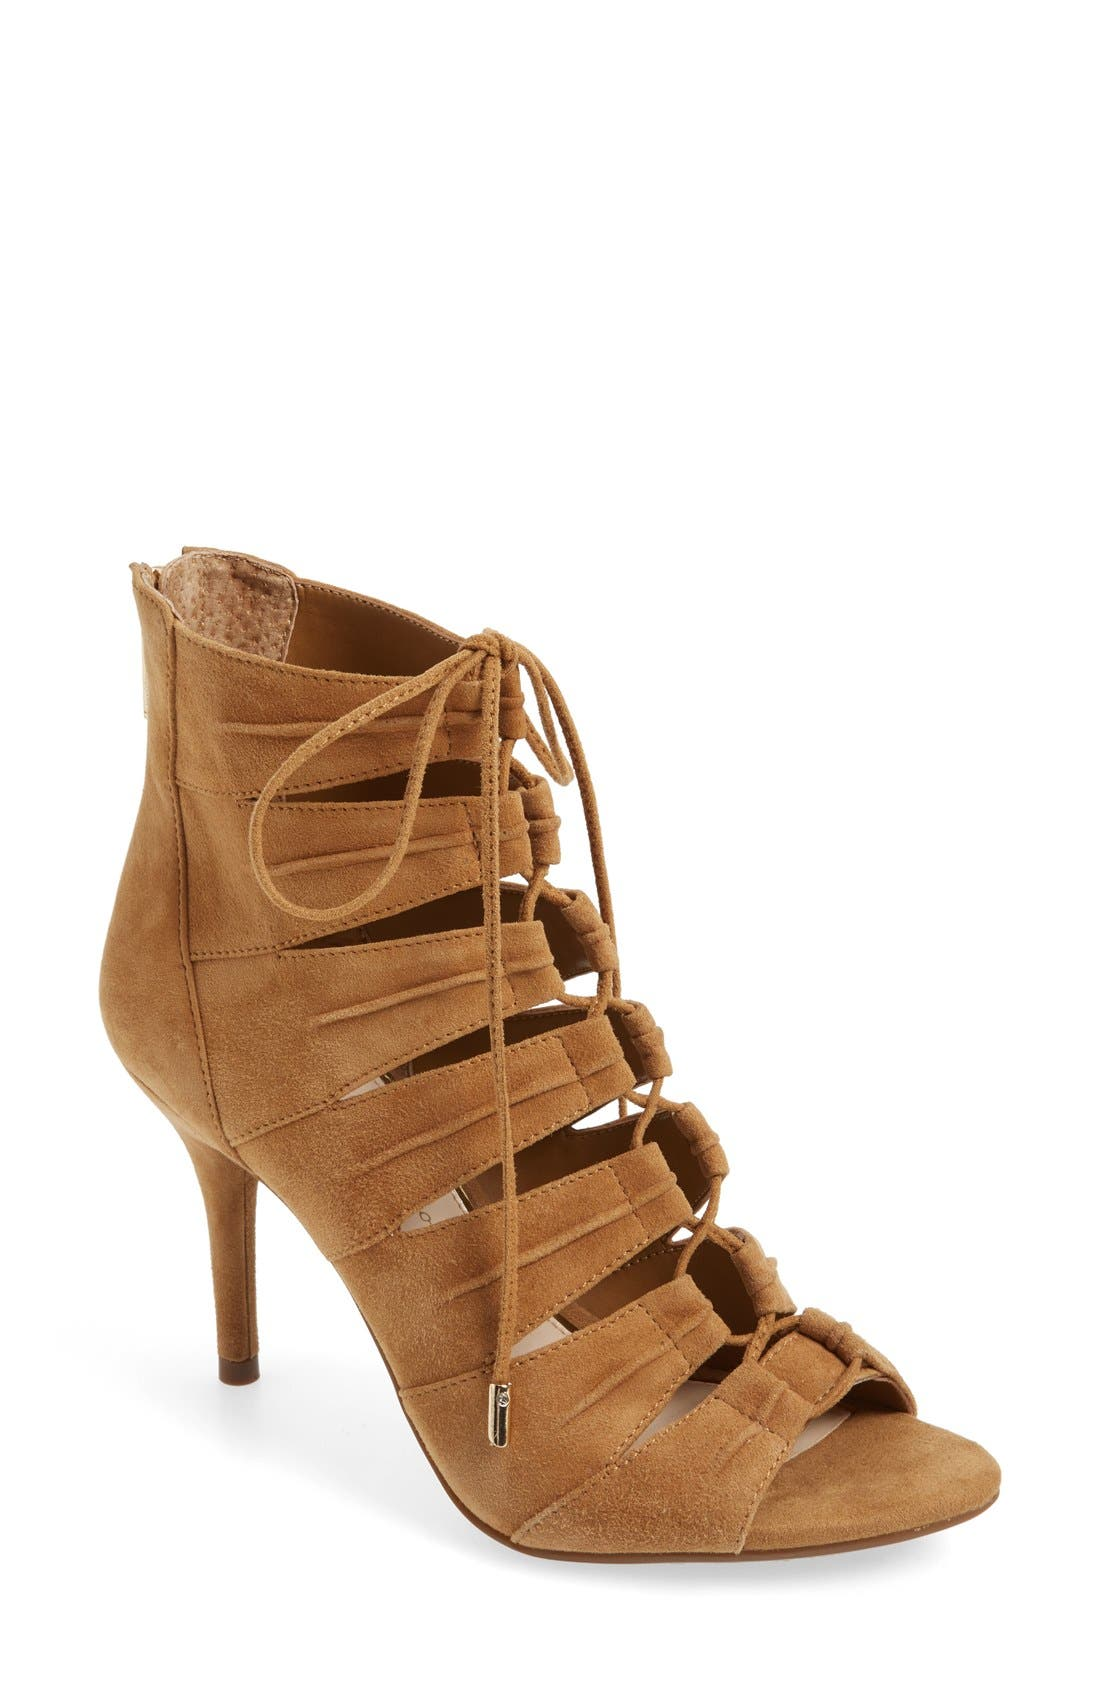 Main Image - Jessica Simpson 'Mahiri' Ghillie Open Toe Bootie (Women)